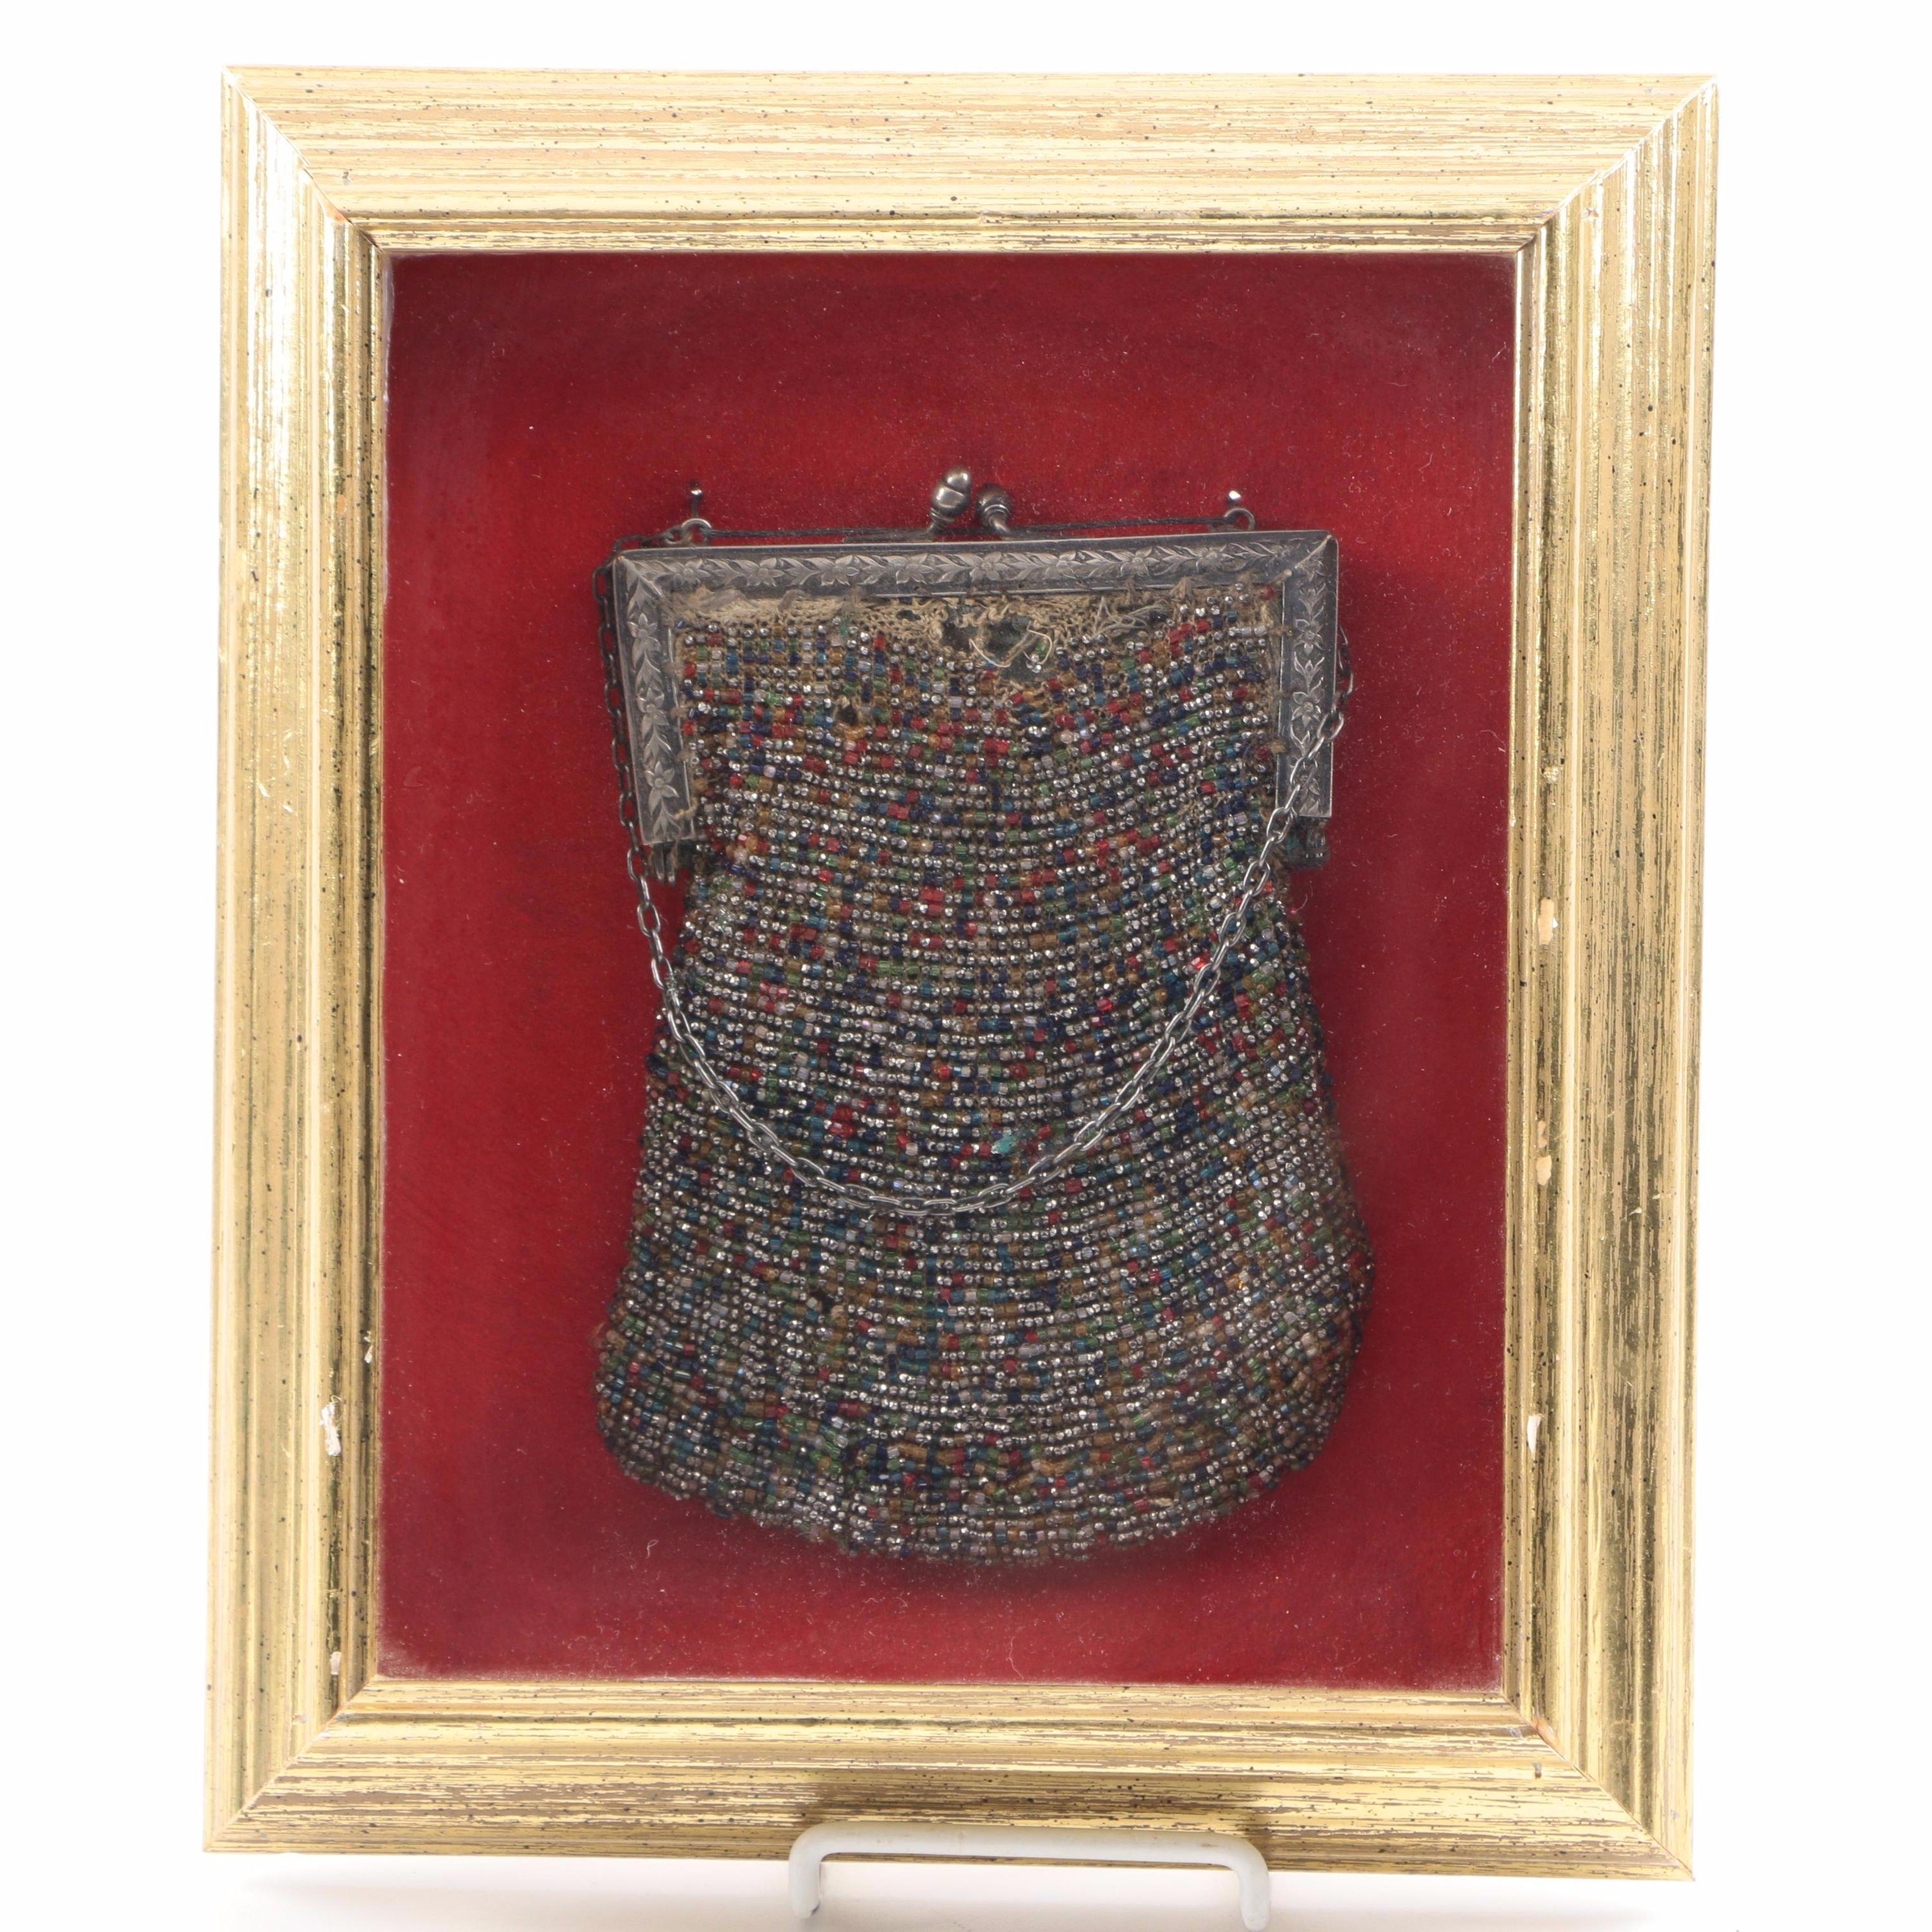 Framed Antique Beaded Purse